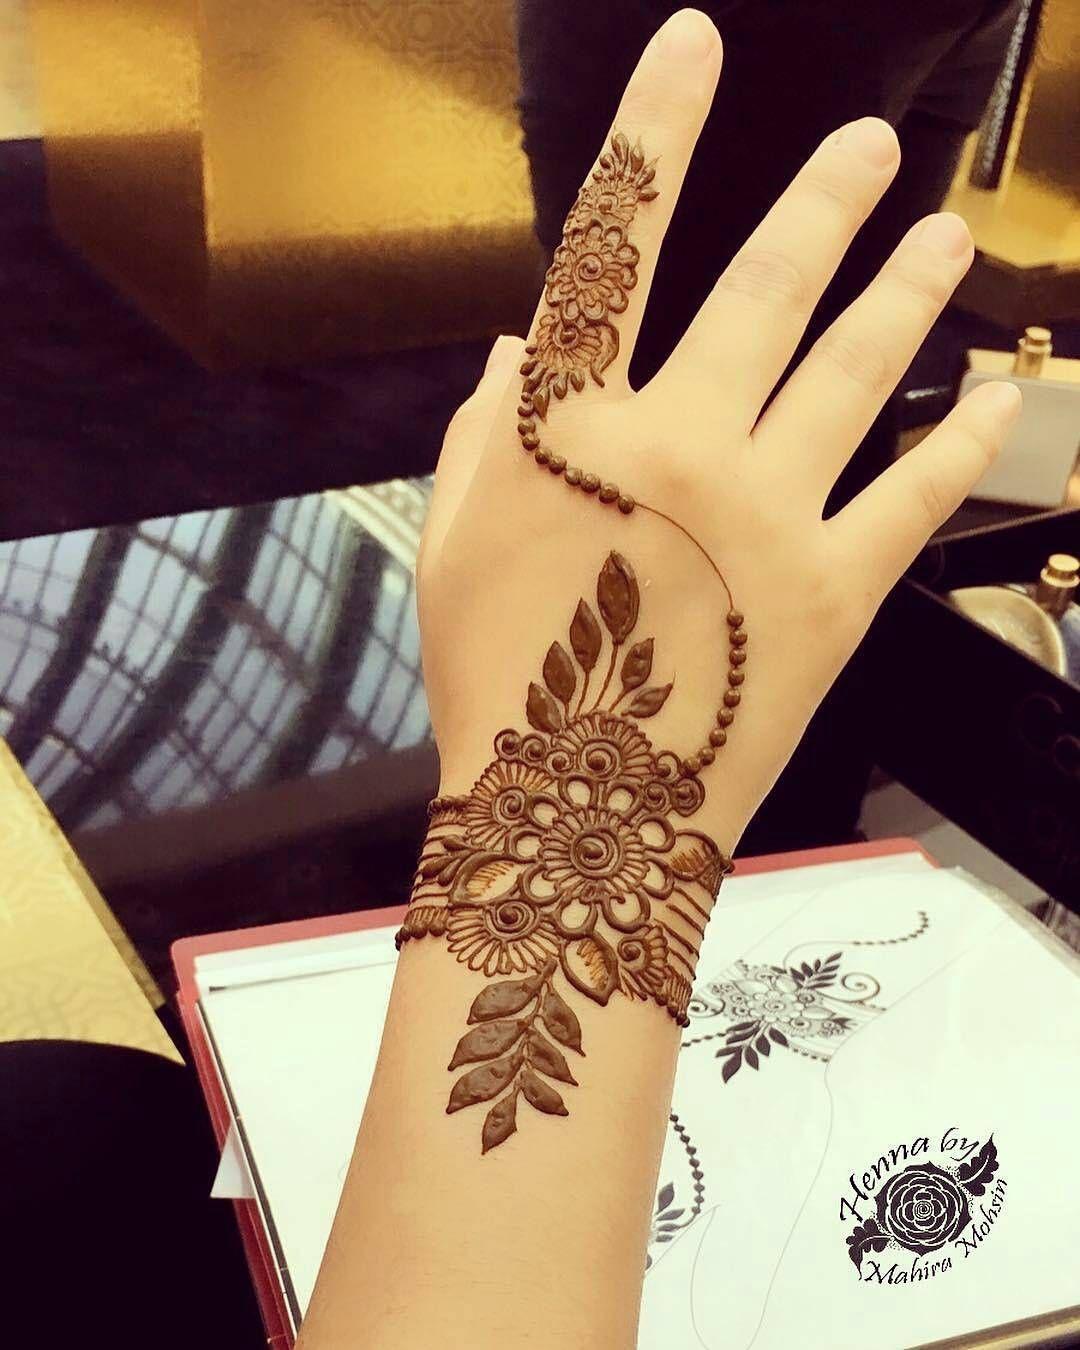 Stylish Unique Mehndi Designs: 7enna Designer_henna_نقش حنة